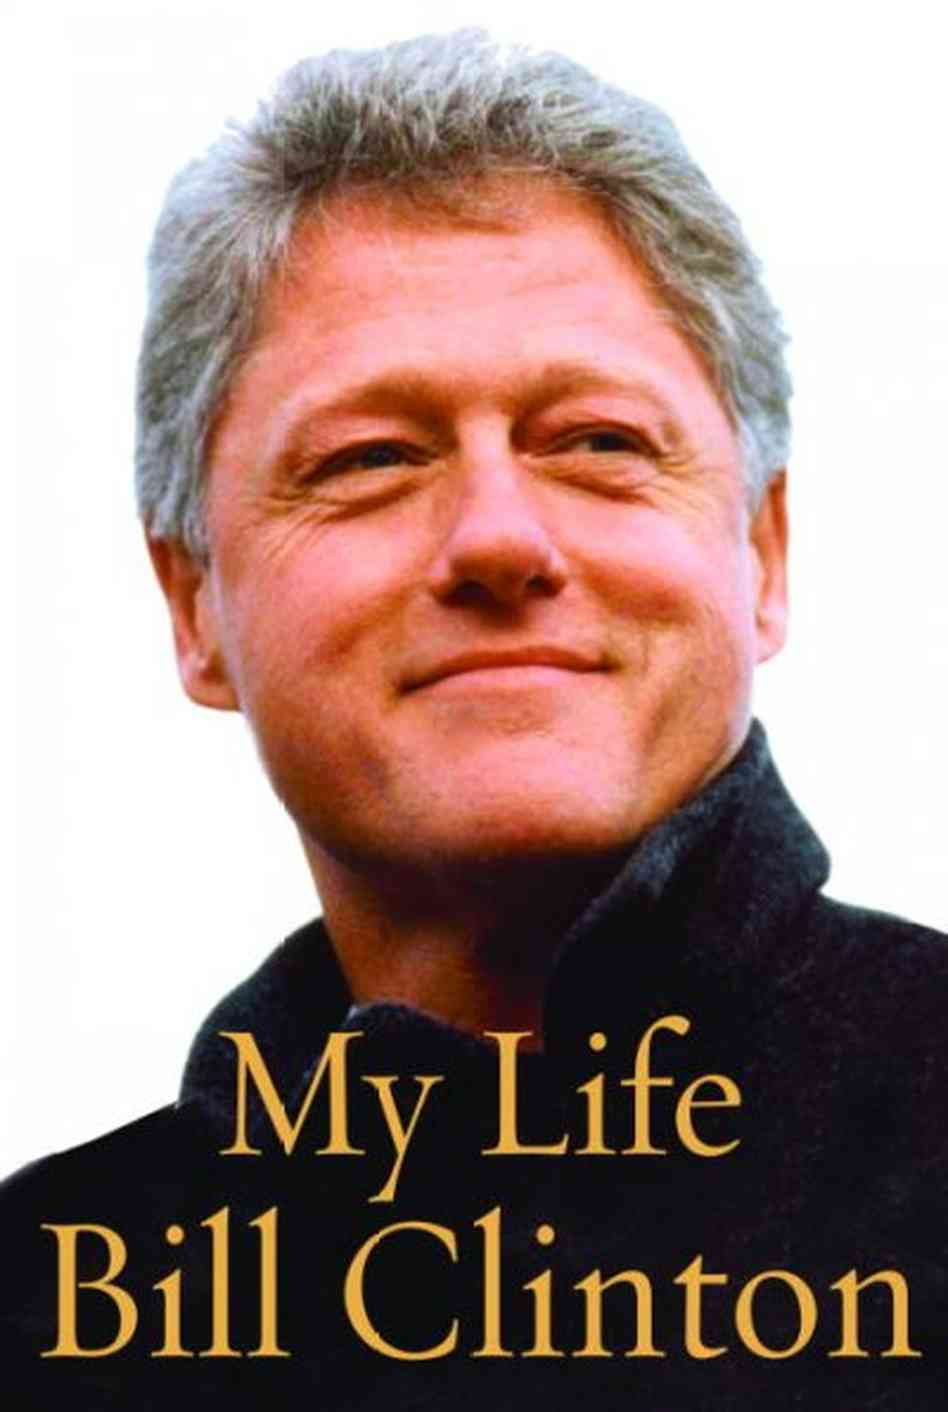 My life bill clinton book